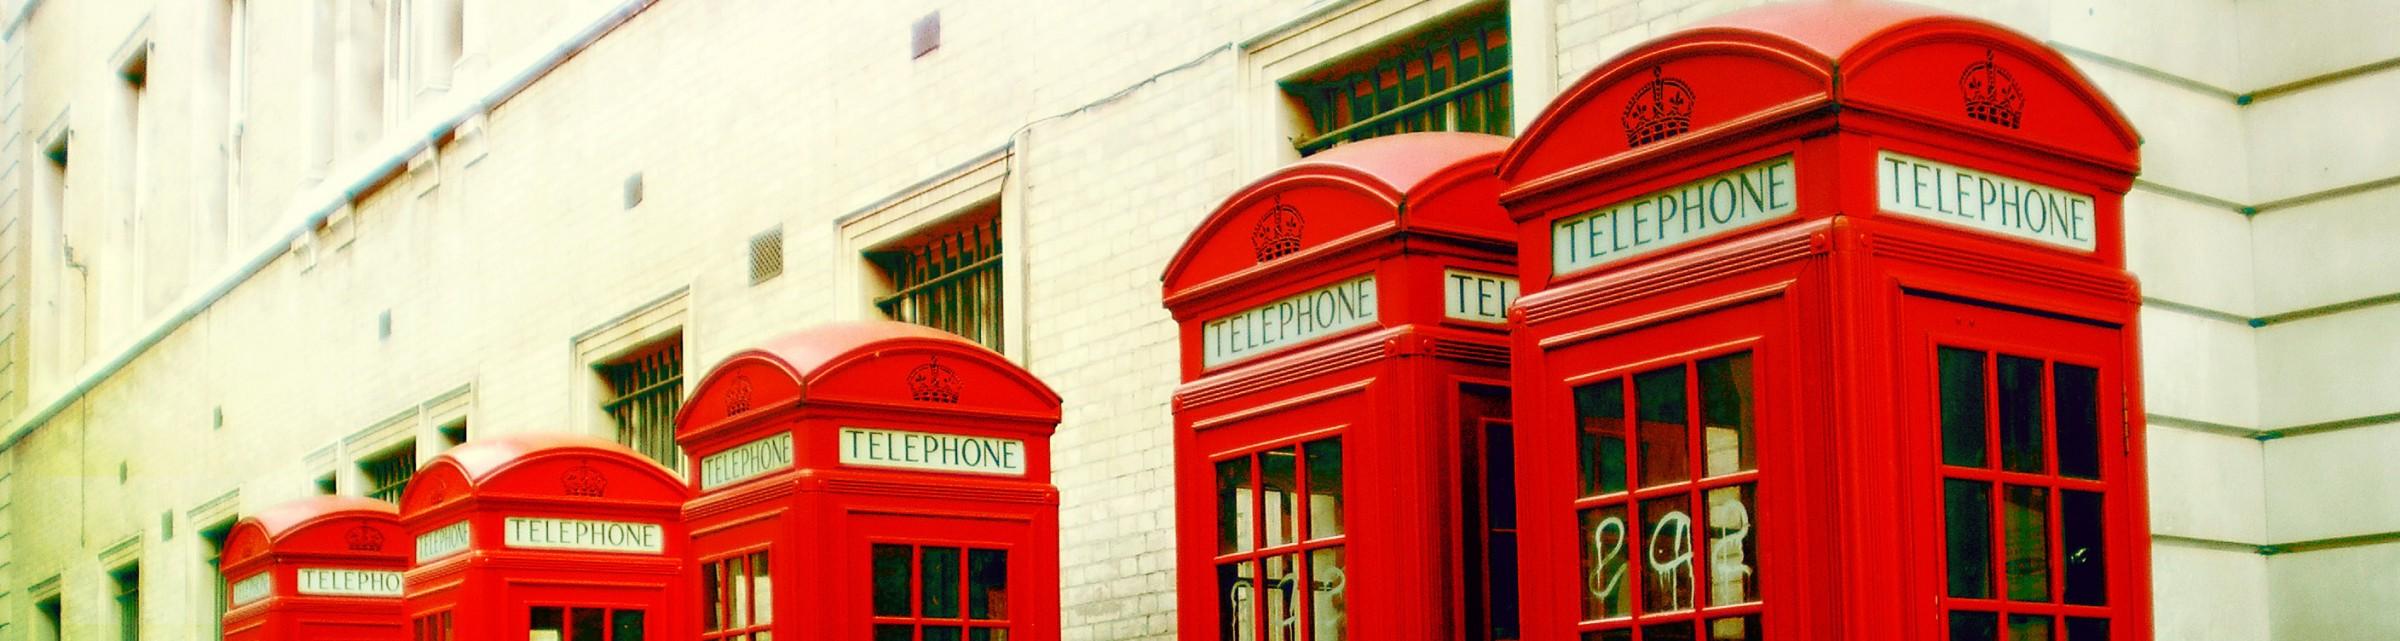 Red pillar boxes london